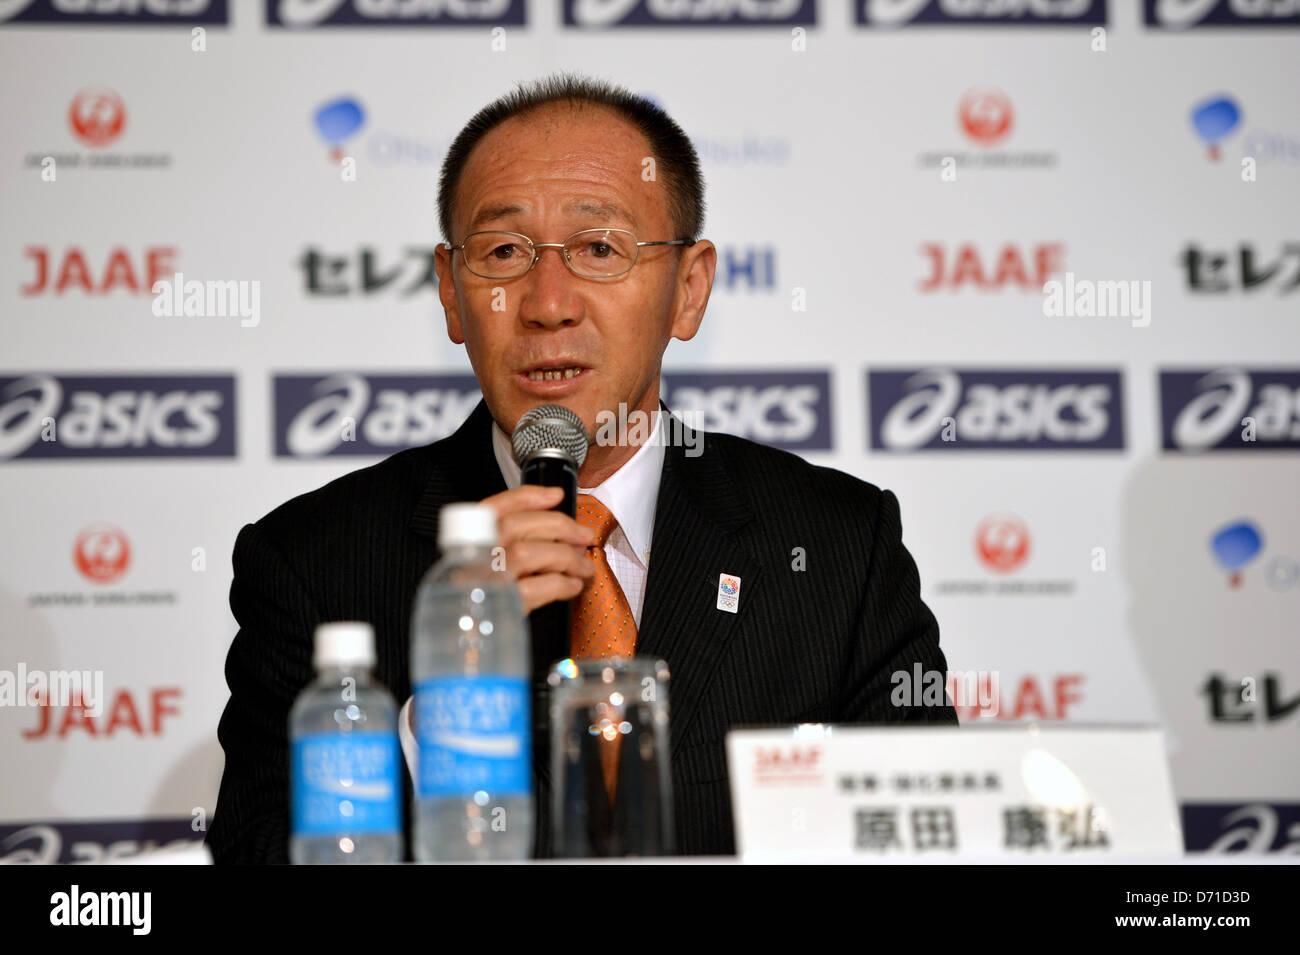 Yasuhiro Harada, APRIL 25, 2013 - Athletics : Japan Association of Athletics Federations' press conference to - Stock Image